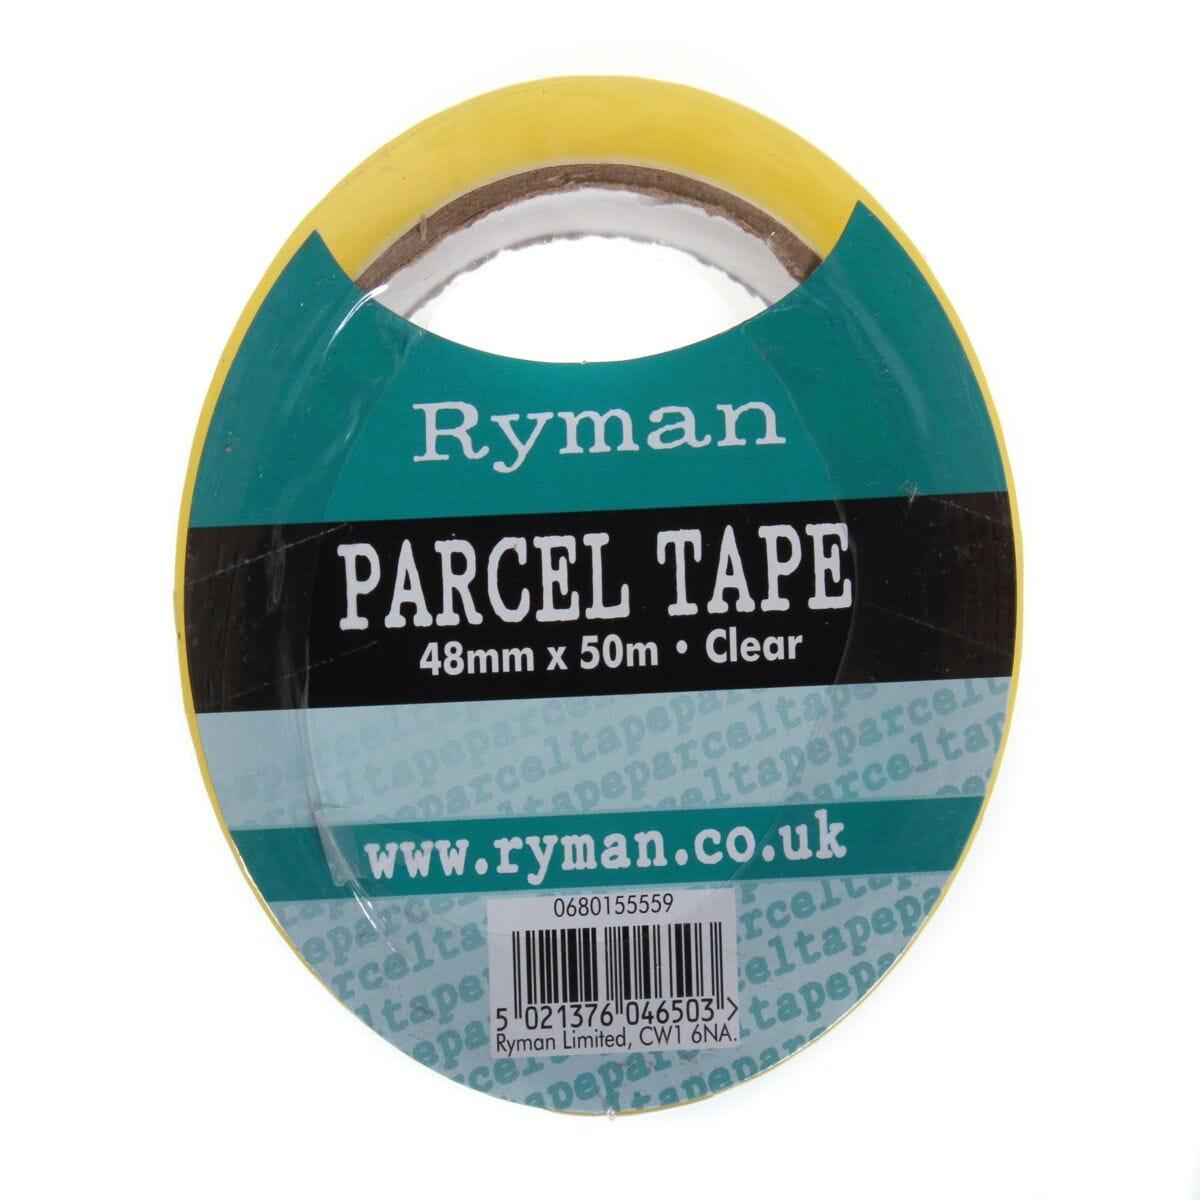 Ryman Parcel Tape 48mmx50m